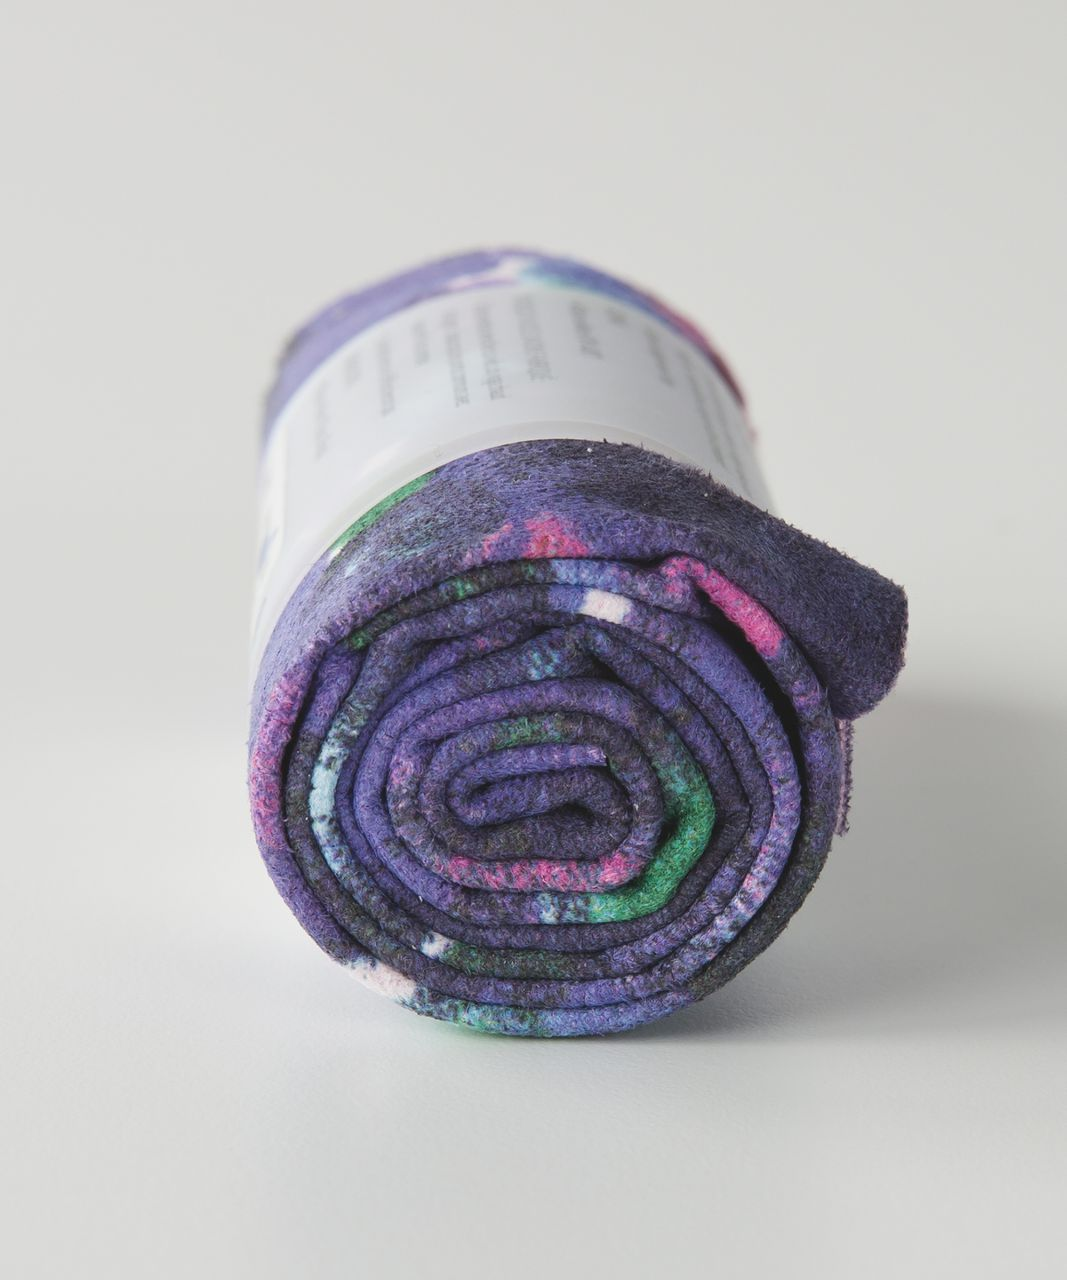 Lululemon The (Small) Towel - Poppy Petal Powdered Rose Multi